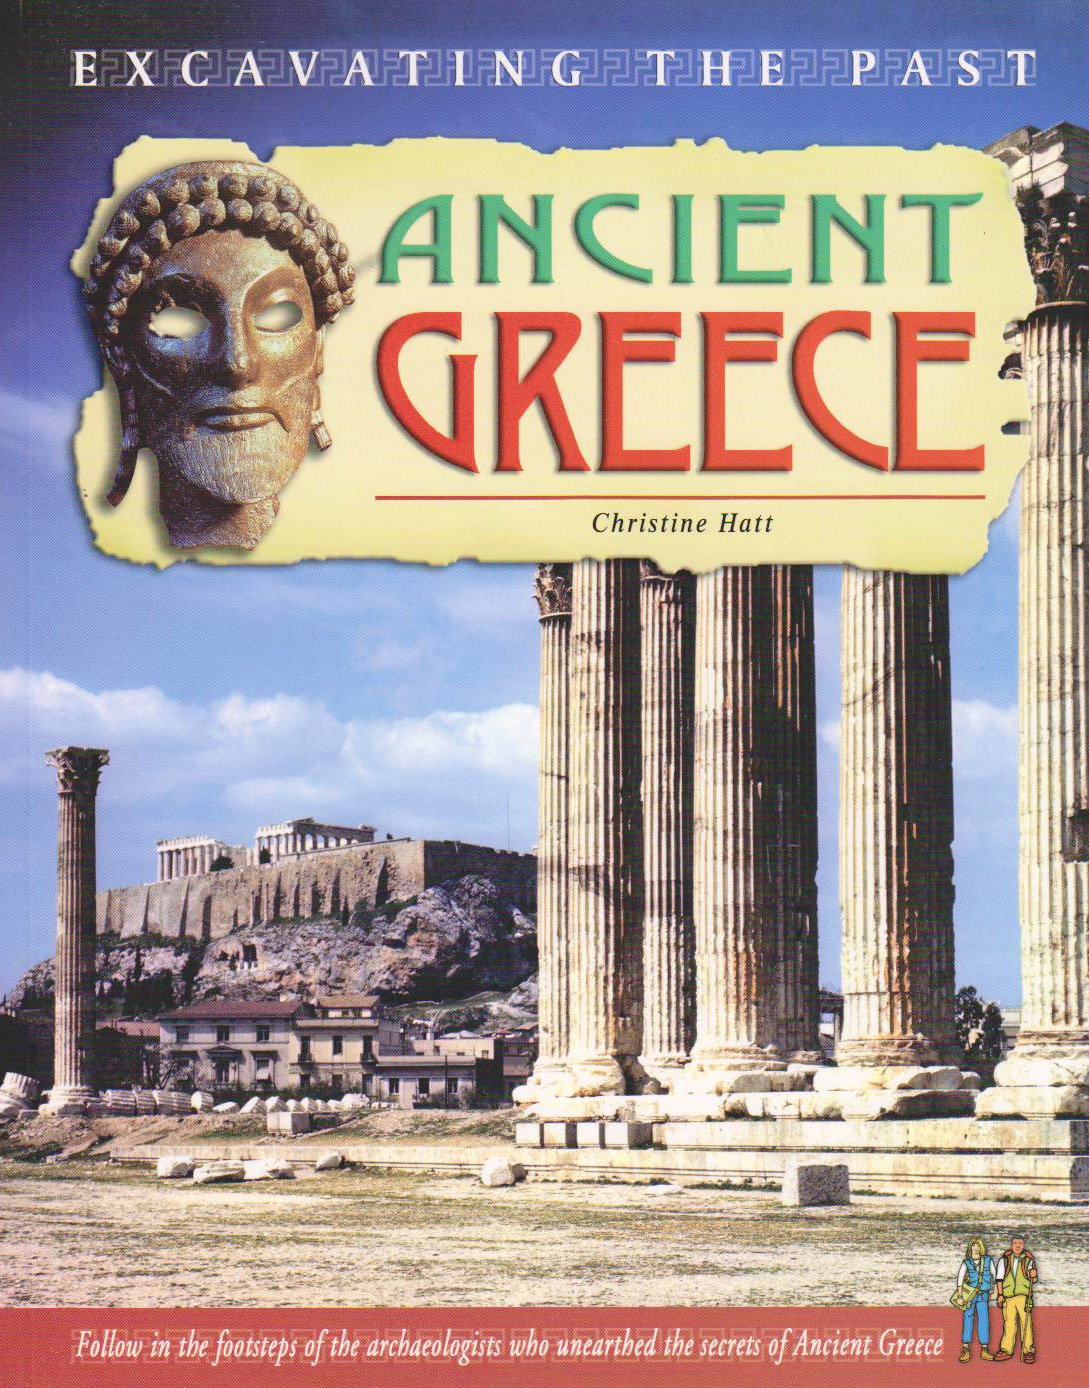 ancient greece excavating the past christine hatt 9781403454577